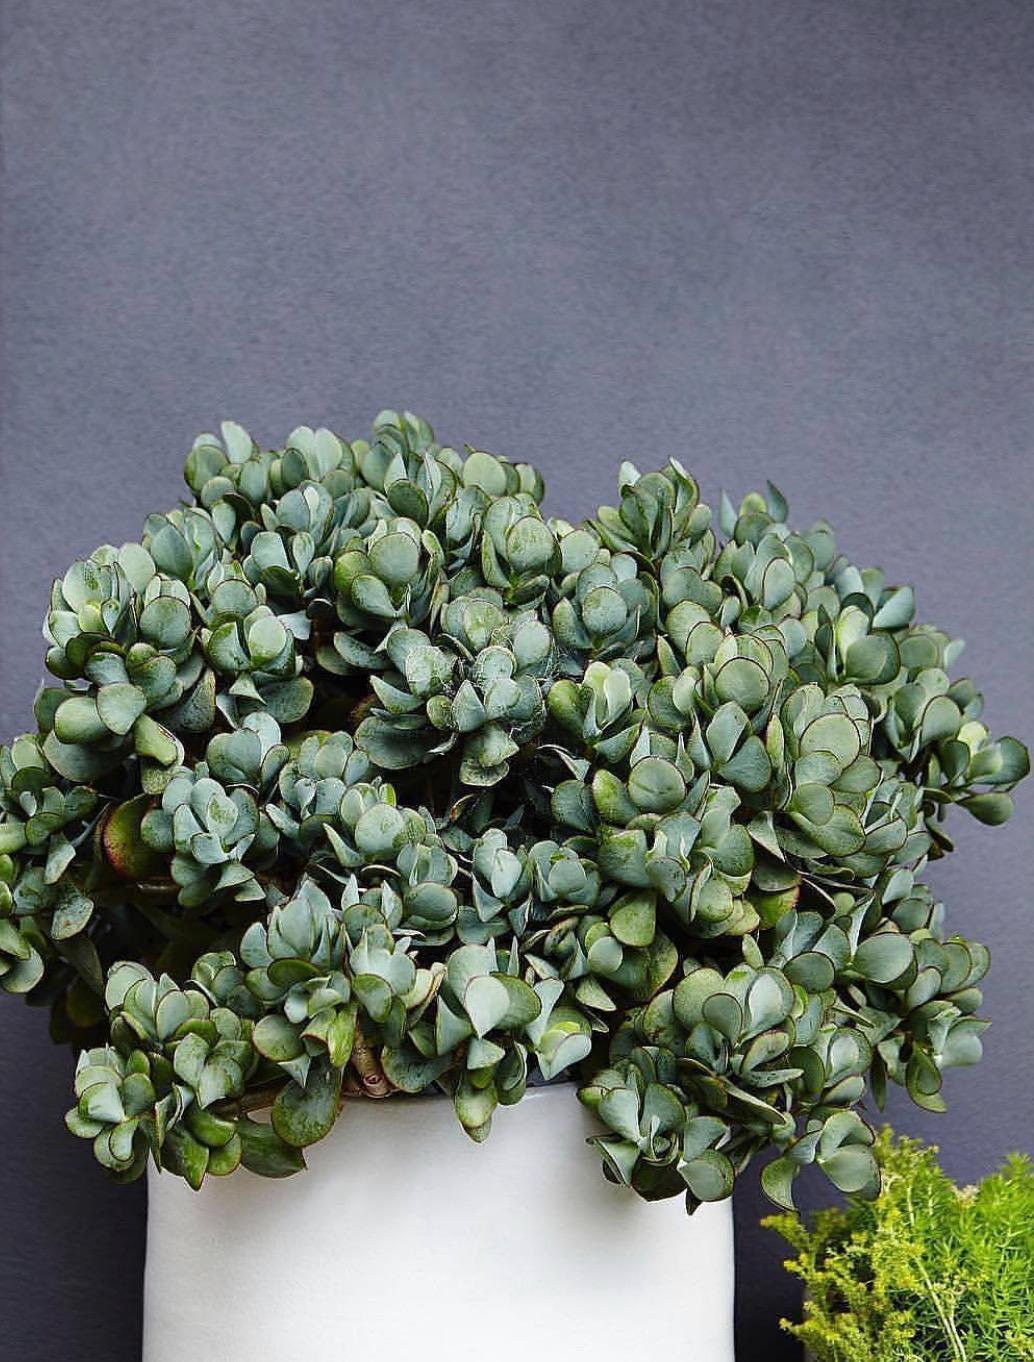 Crassula ovata or Blue Jade -